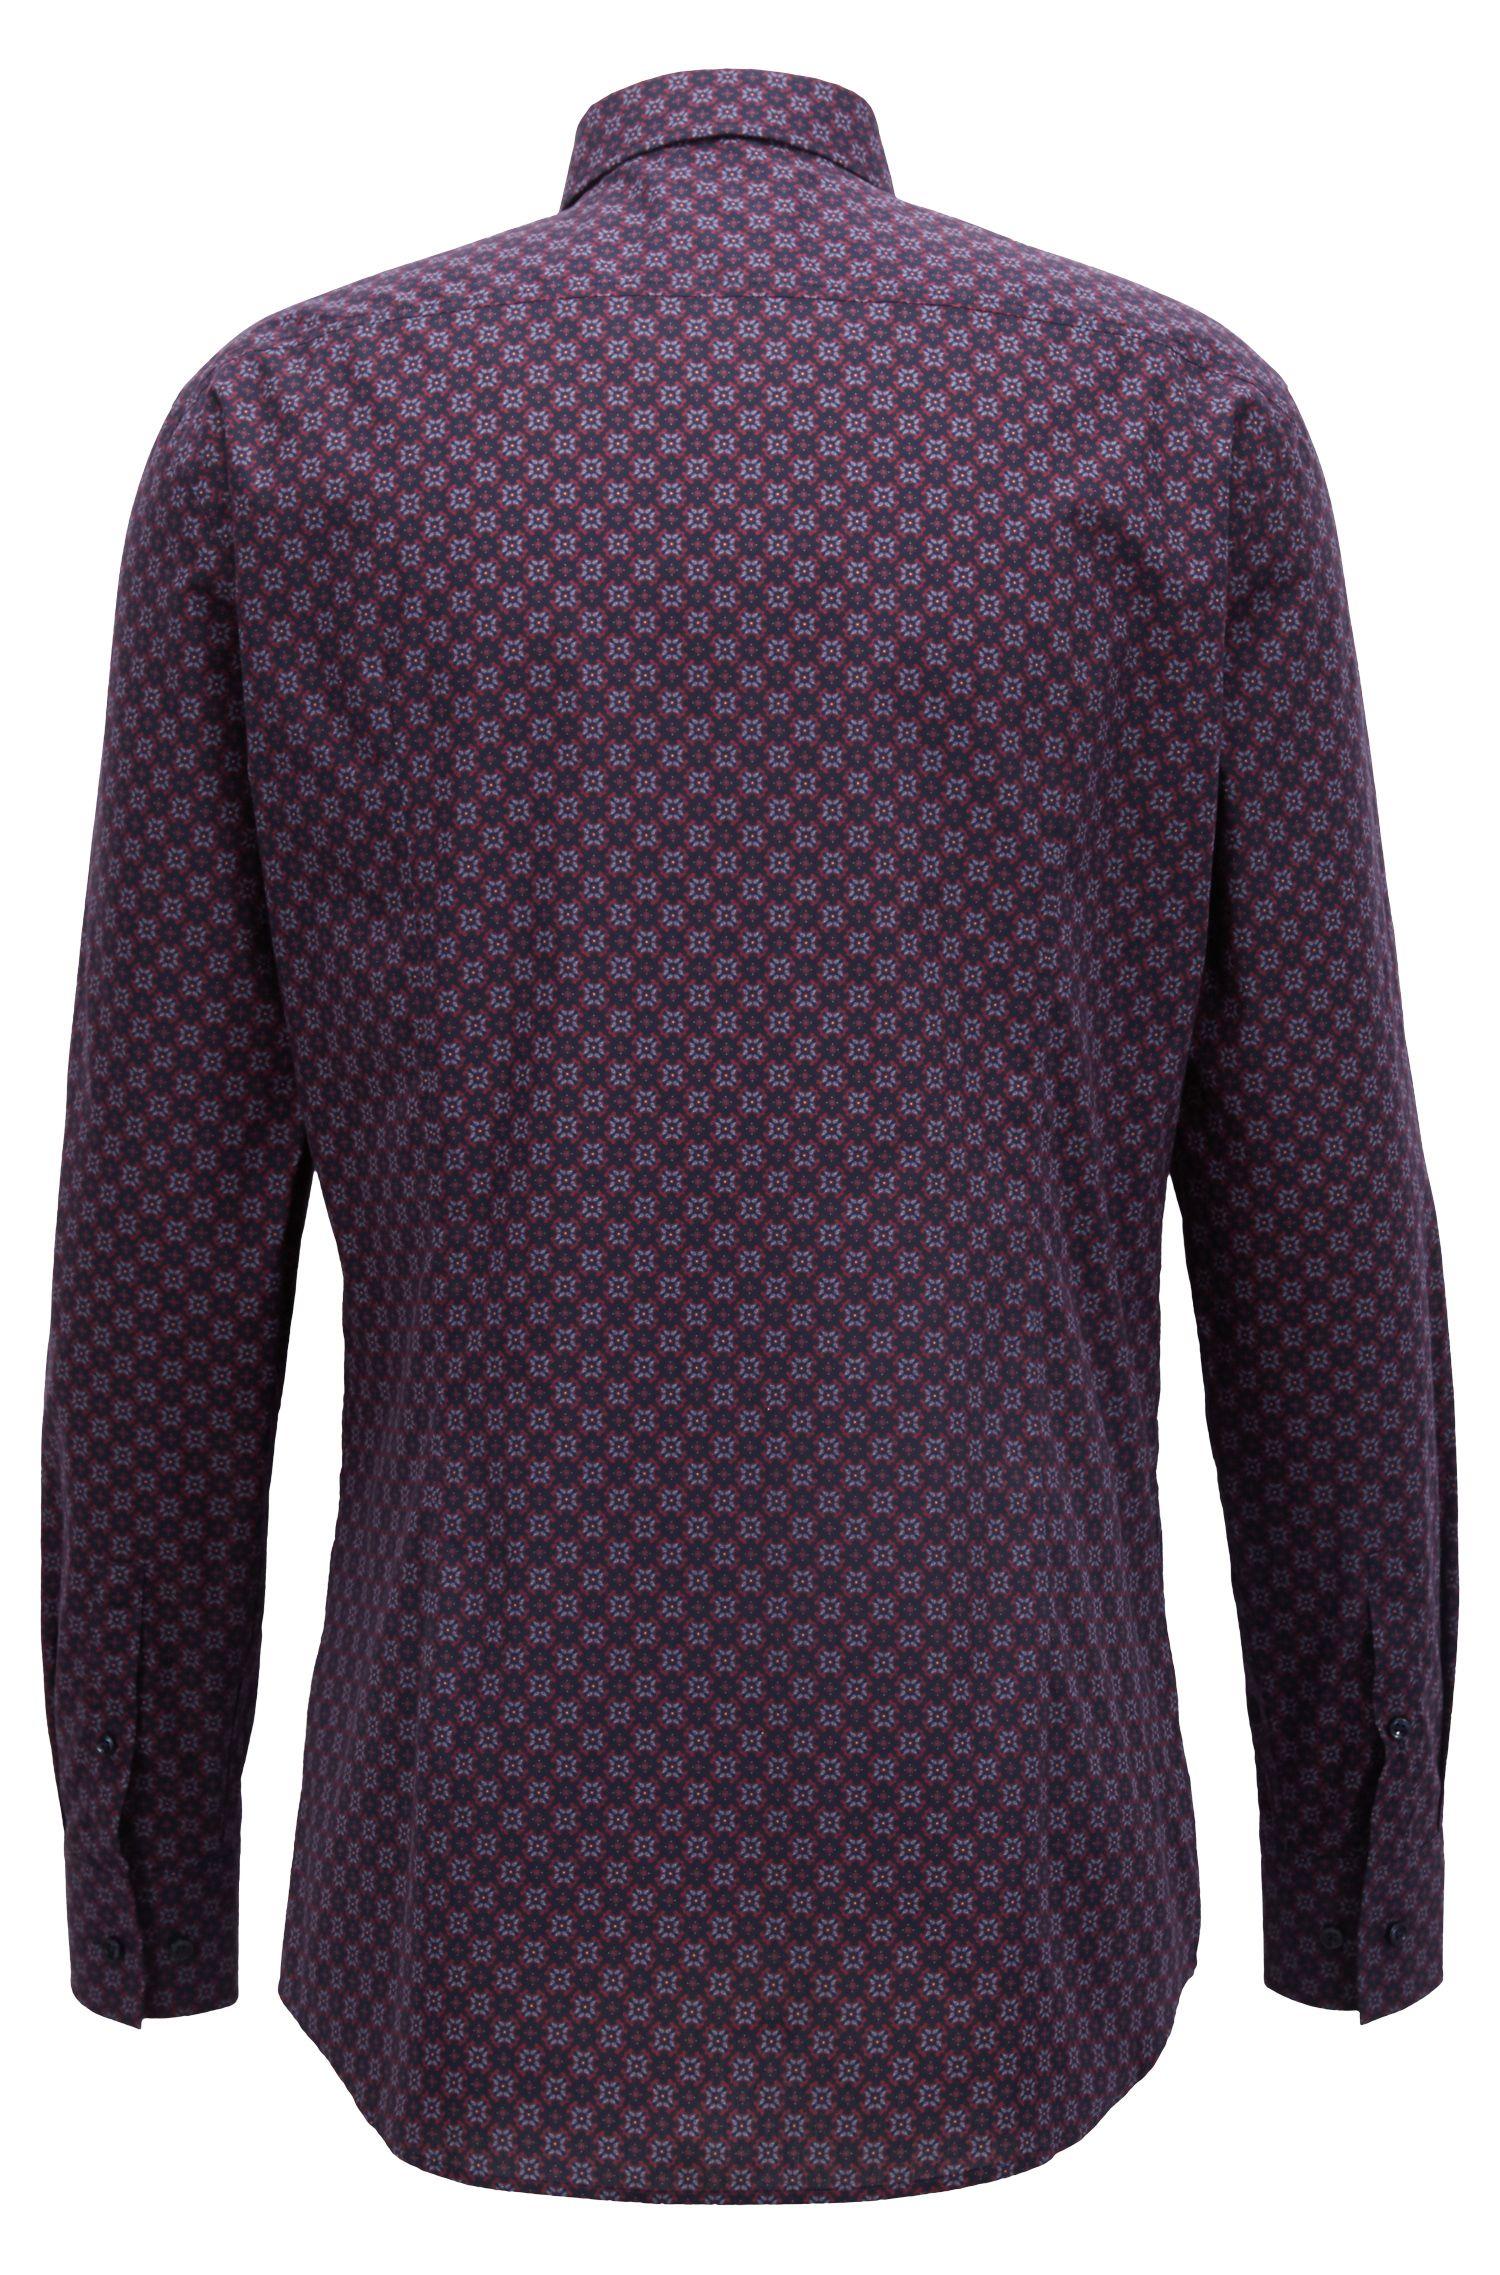 Slim-fit shirt in Italian cotton with seasonal motif